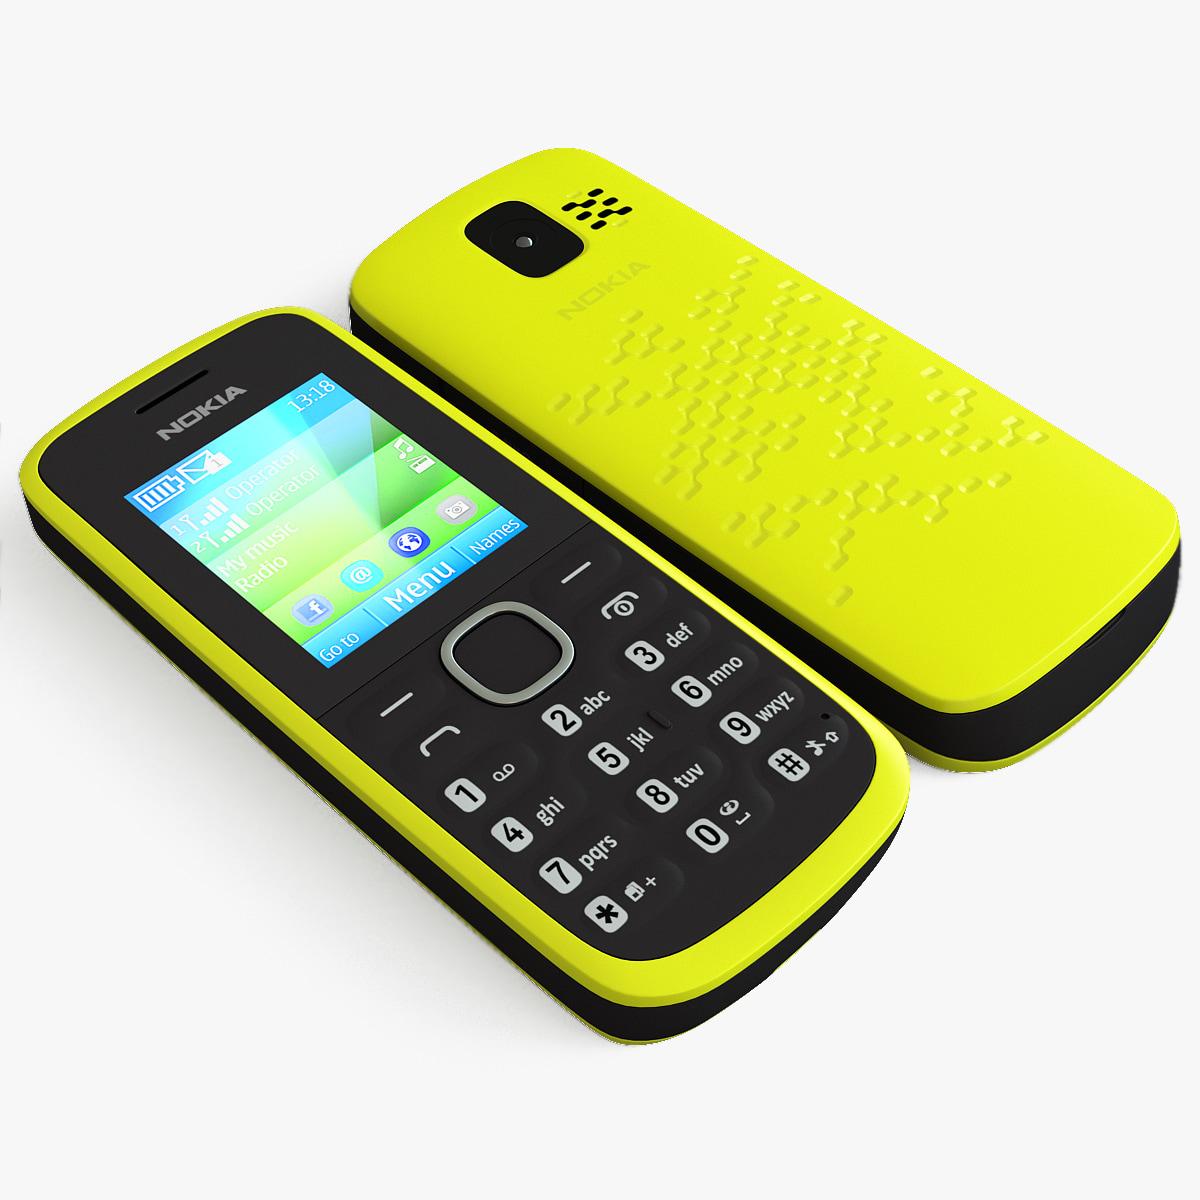 Nokia_110_Yellow_000.jpg